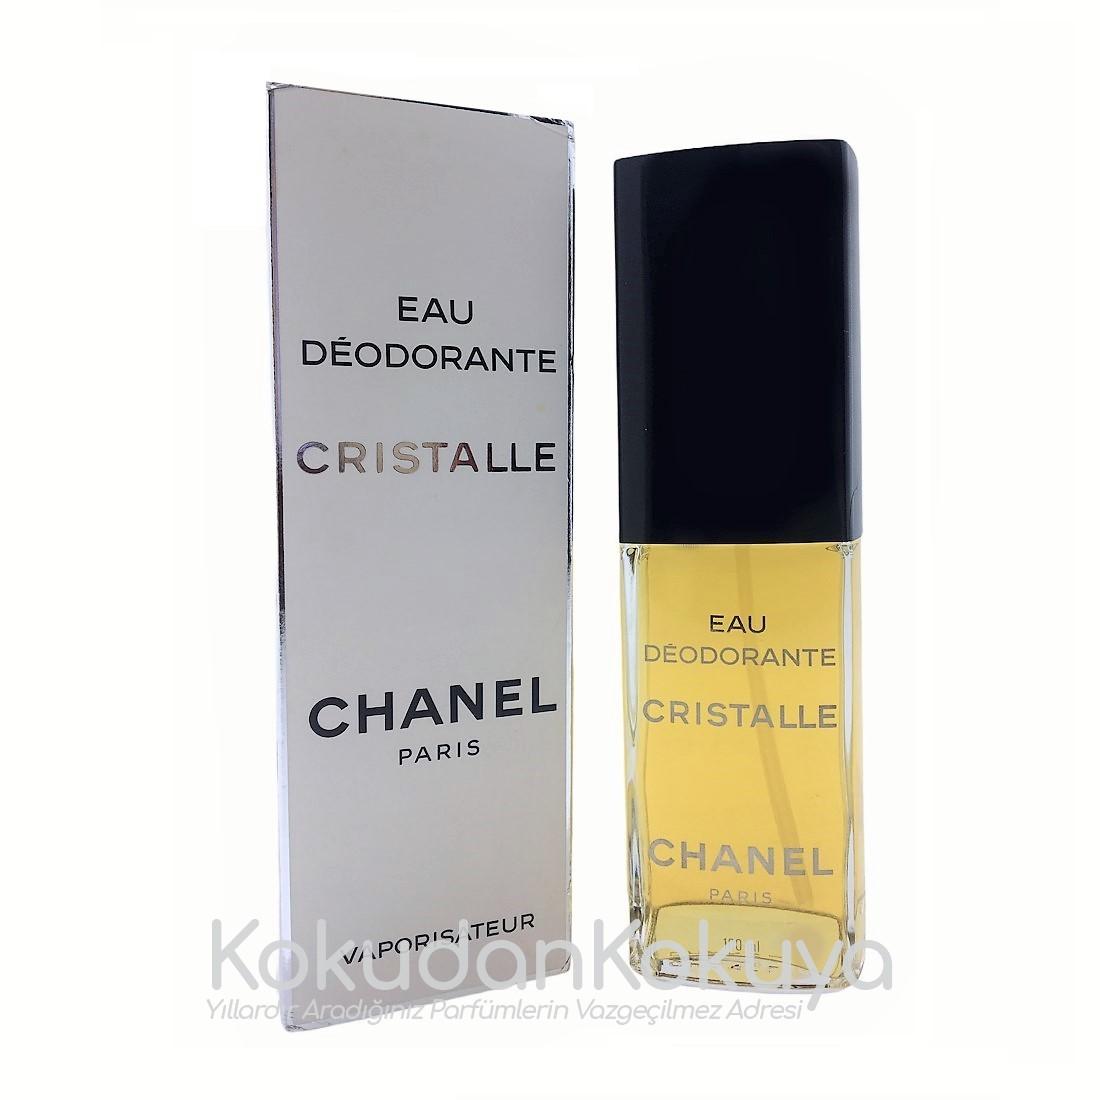 CHANEL Cristalle (Vintage) Deodorant Kadın 100ml Deodorant Spray (Cam)